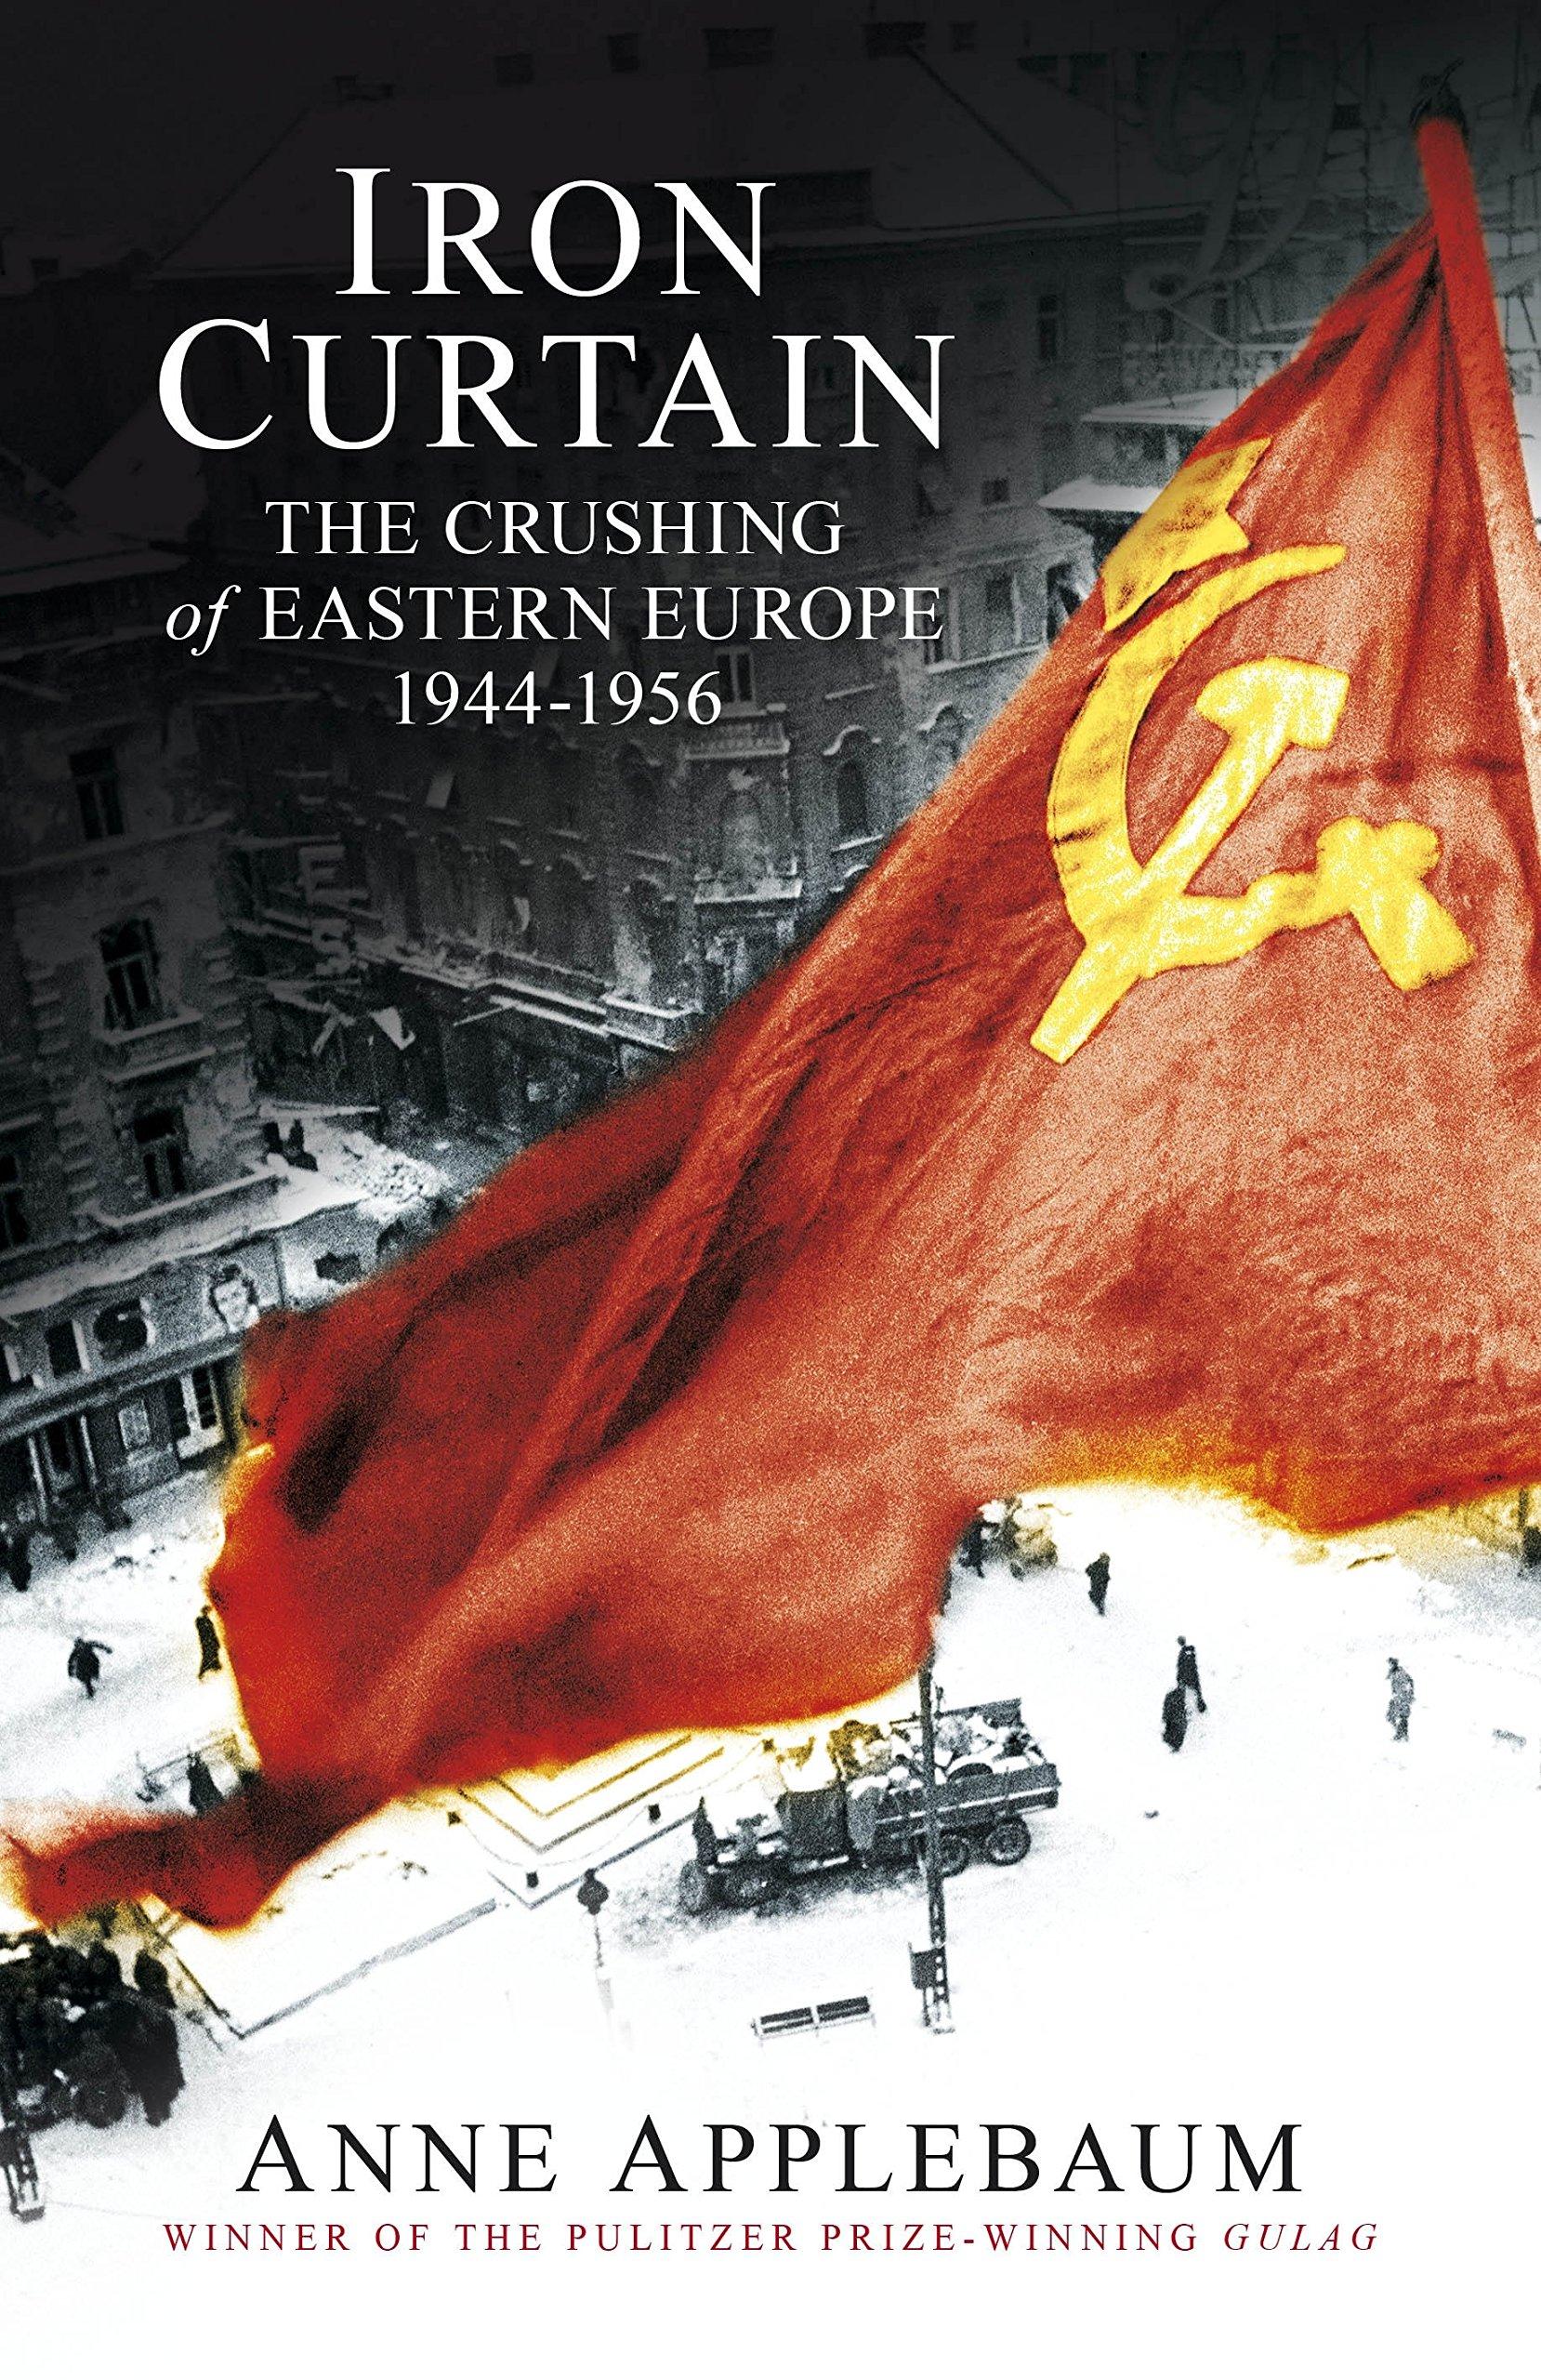 Iron Curtain: The Crushing of Eastern Europe 1944-56 ebook